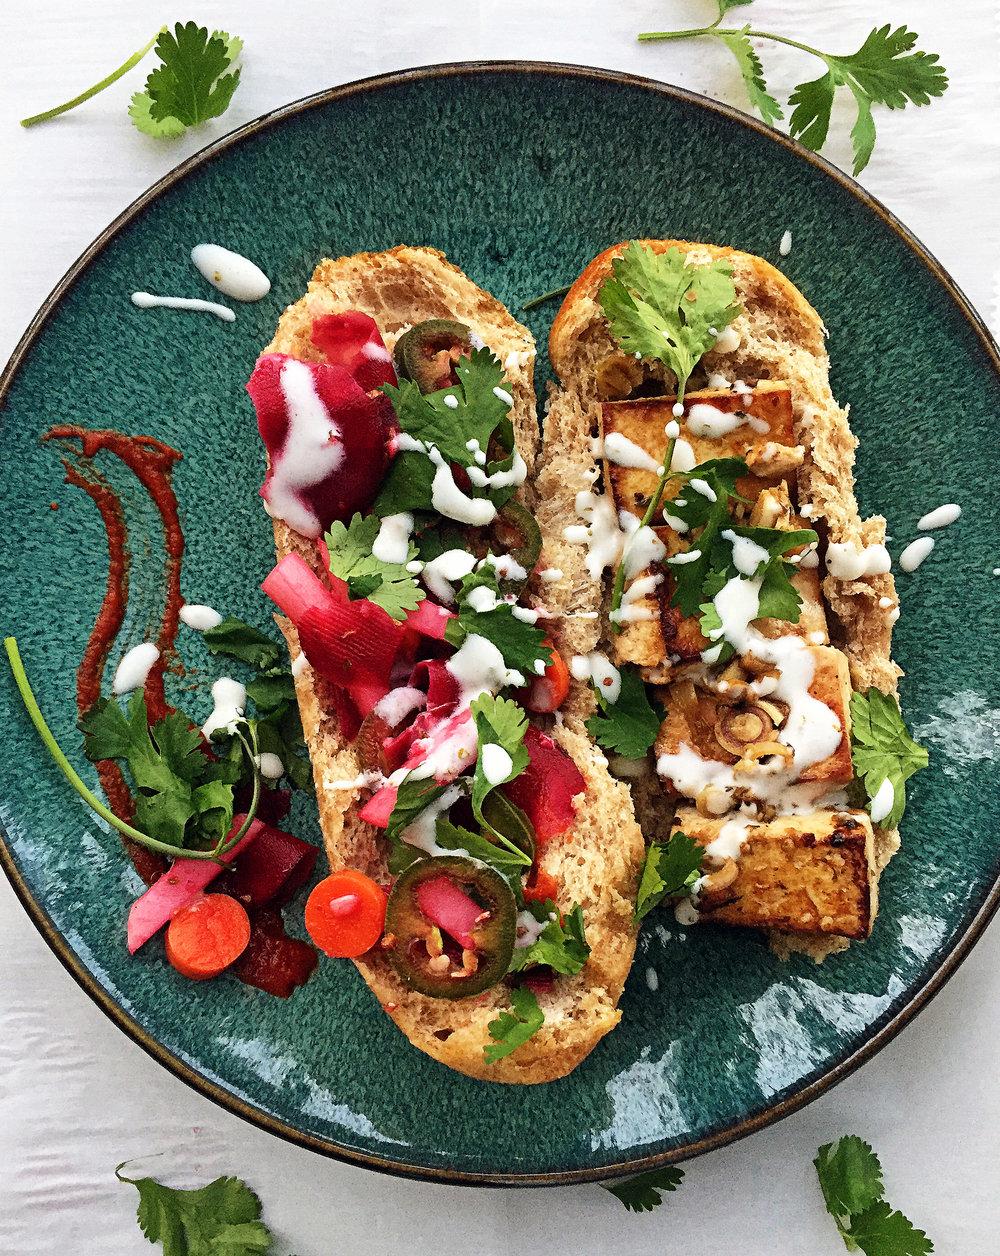 7. To serve, give yourself a nice helping of pickled veggies, cilantro, tofu, aioli, and sriracha. Enjoy!